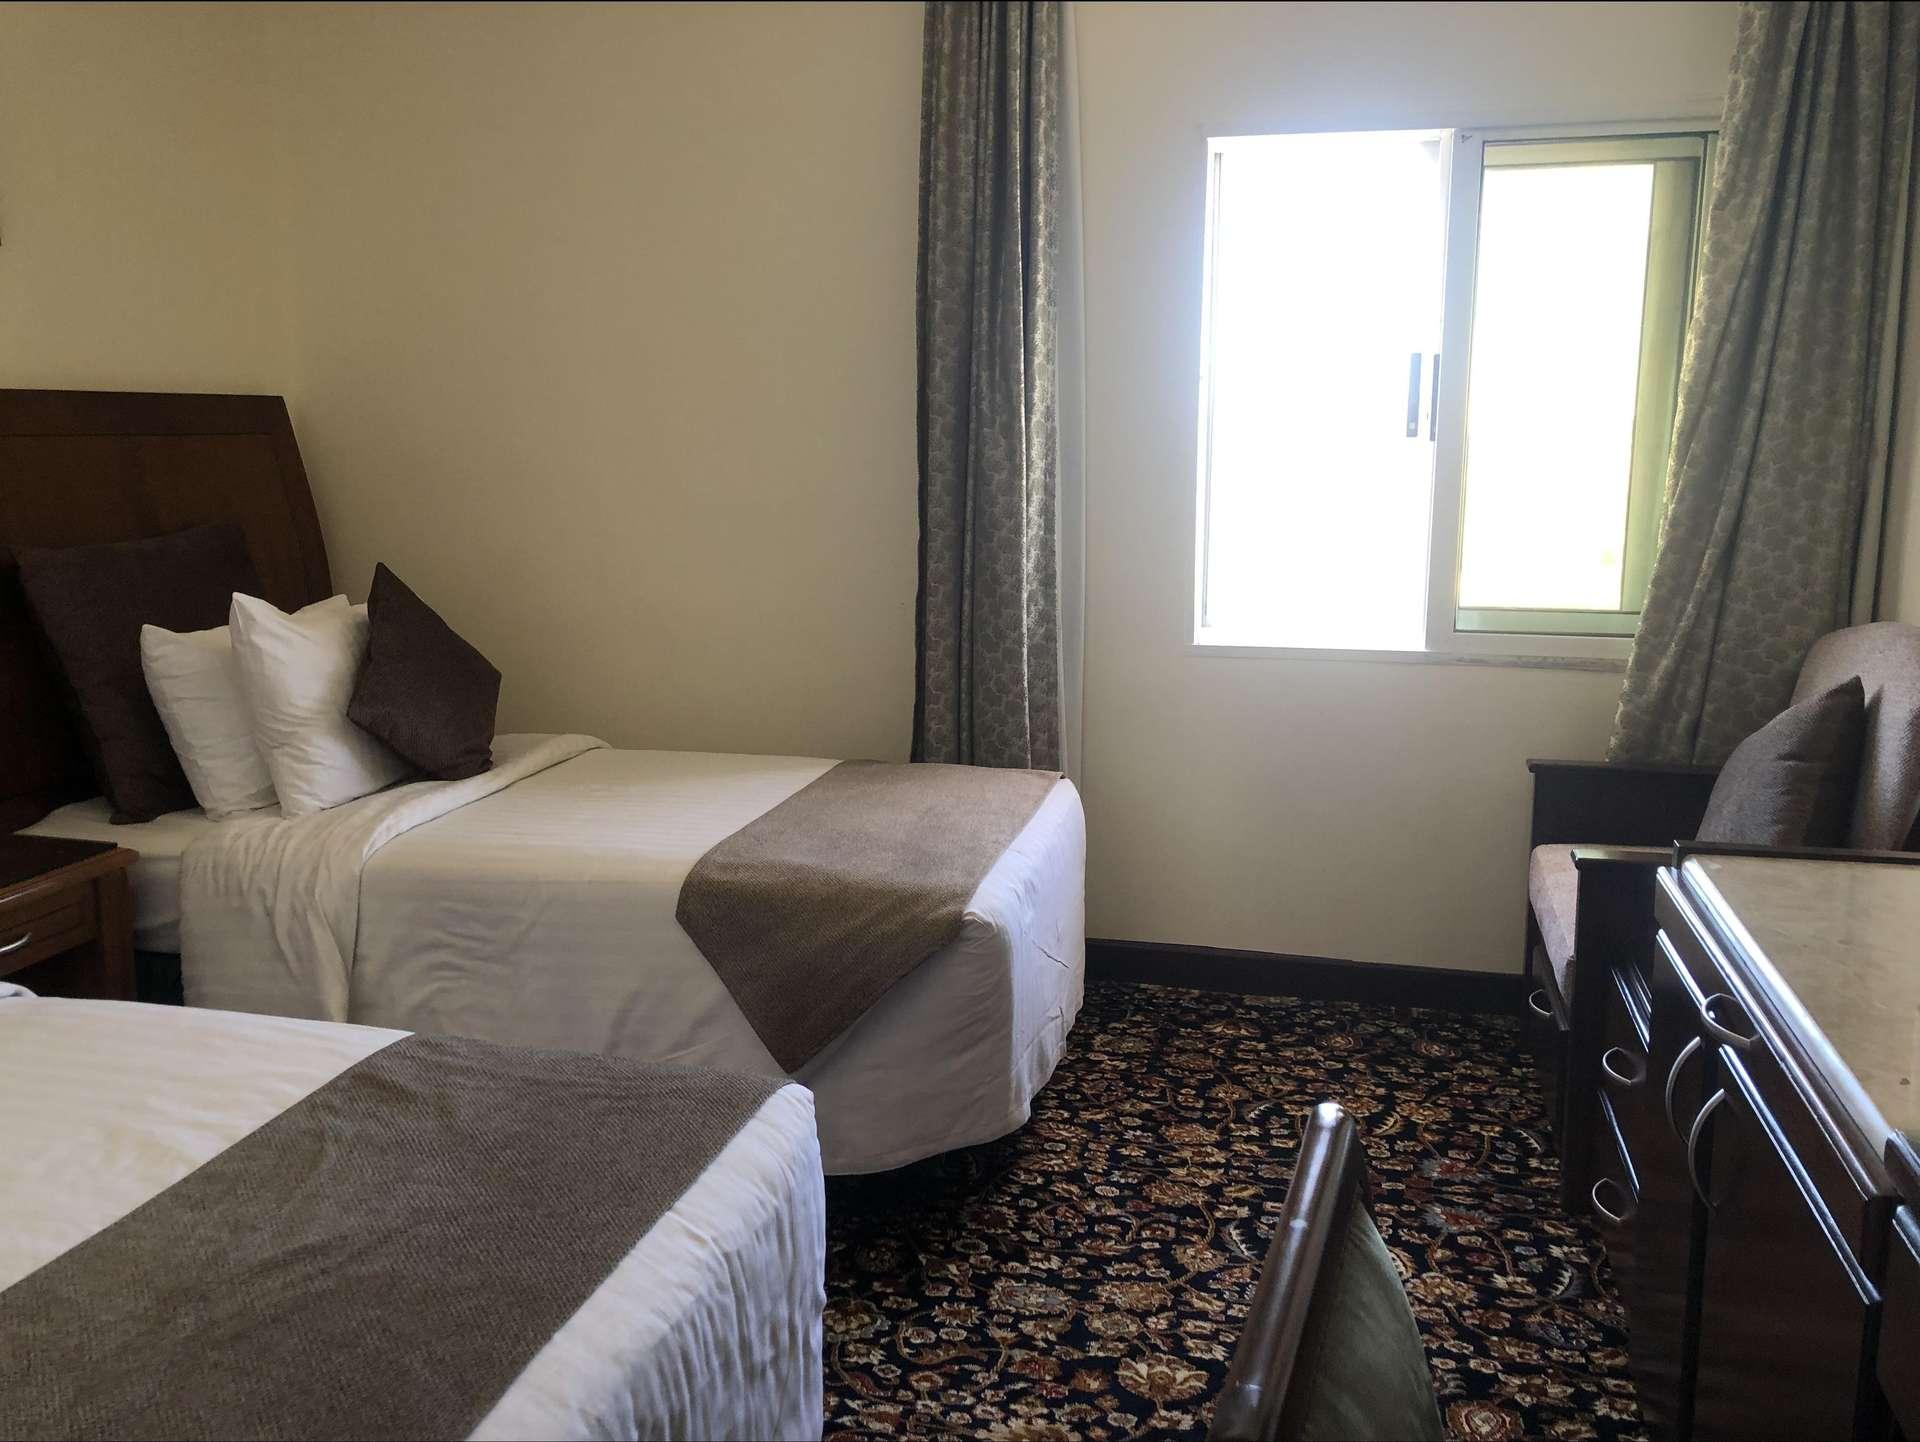 Hotel Amra Palace standaard kamer - Petra